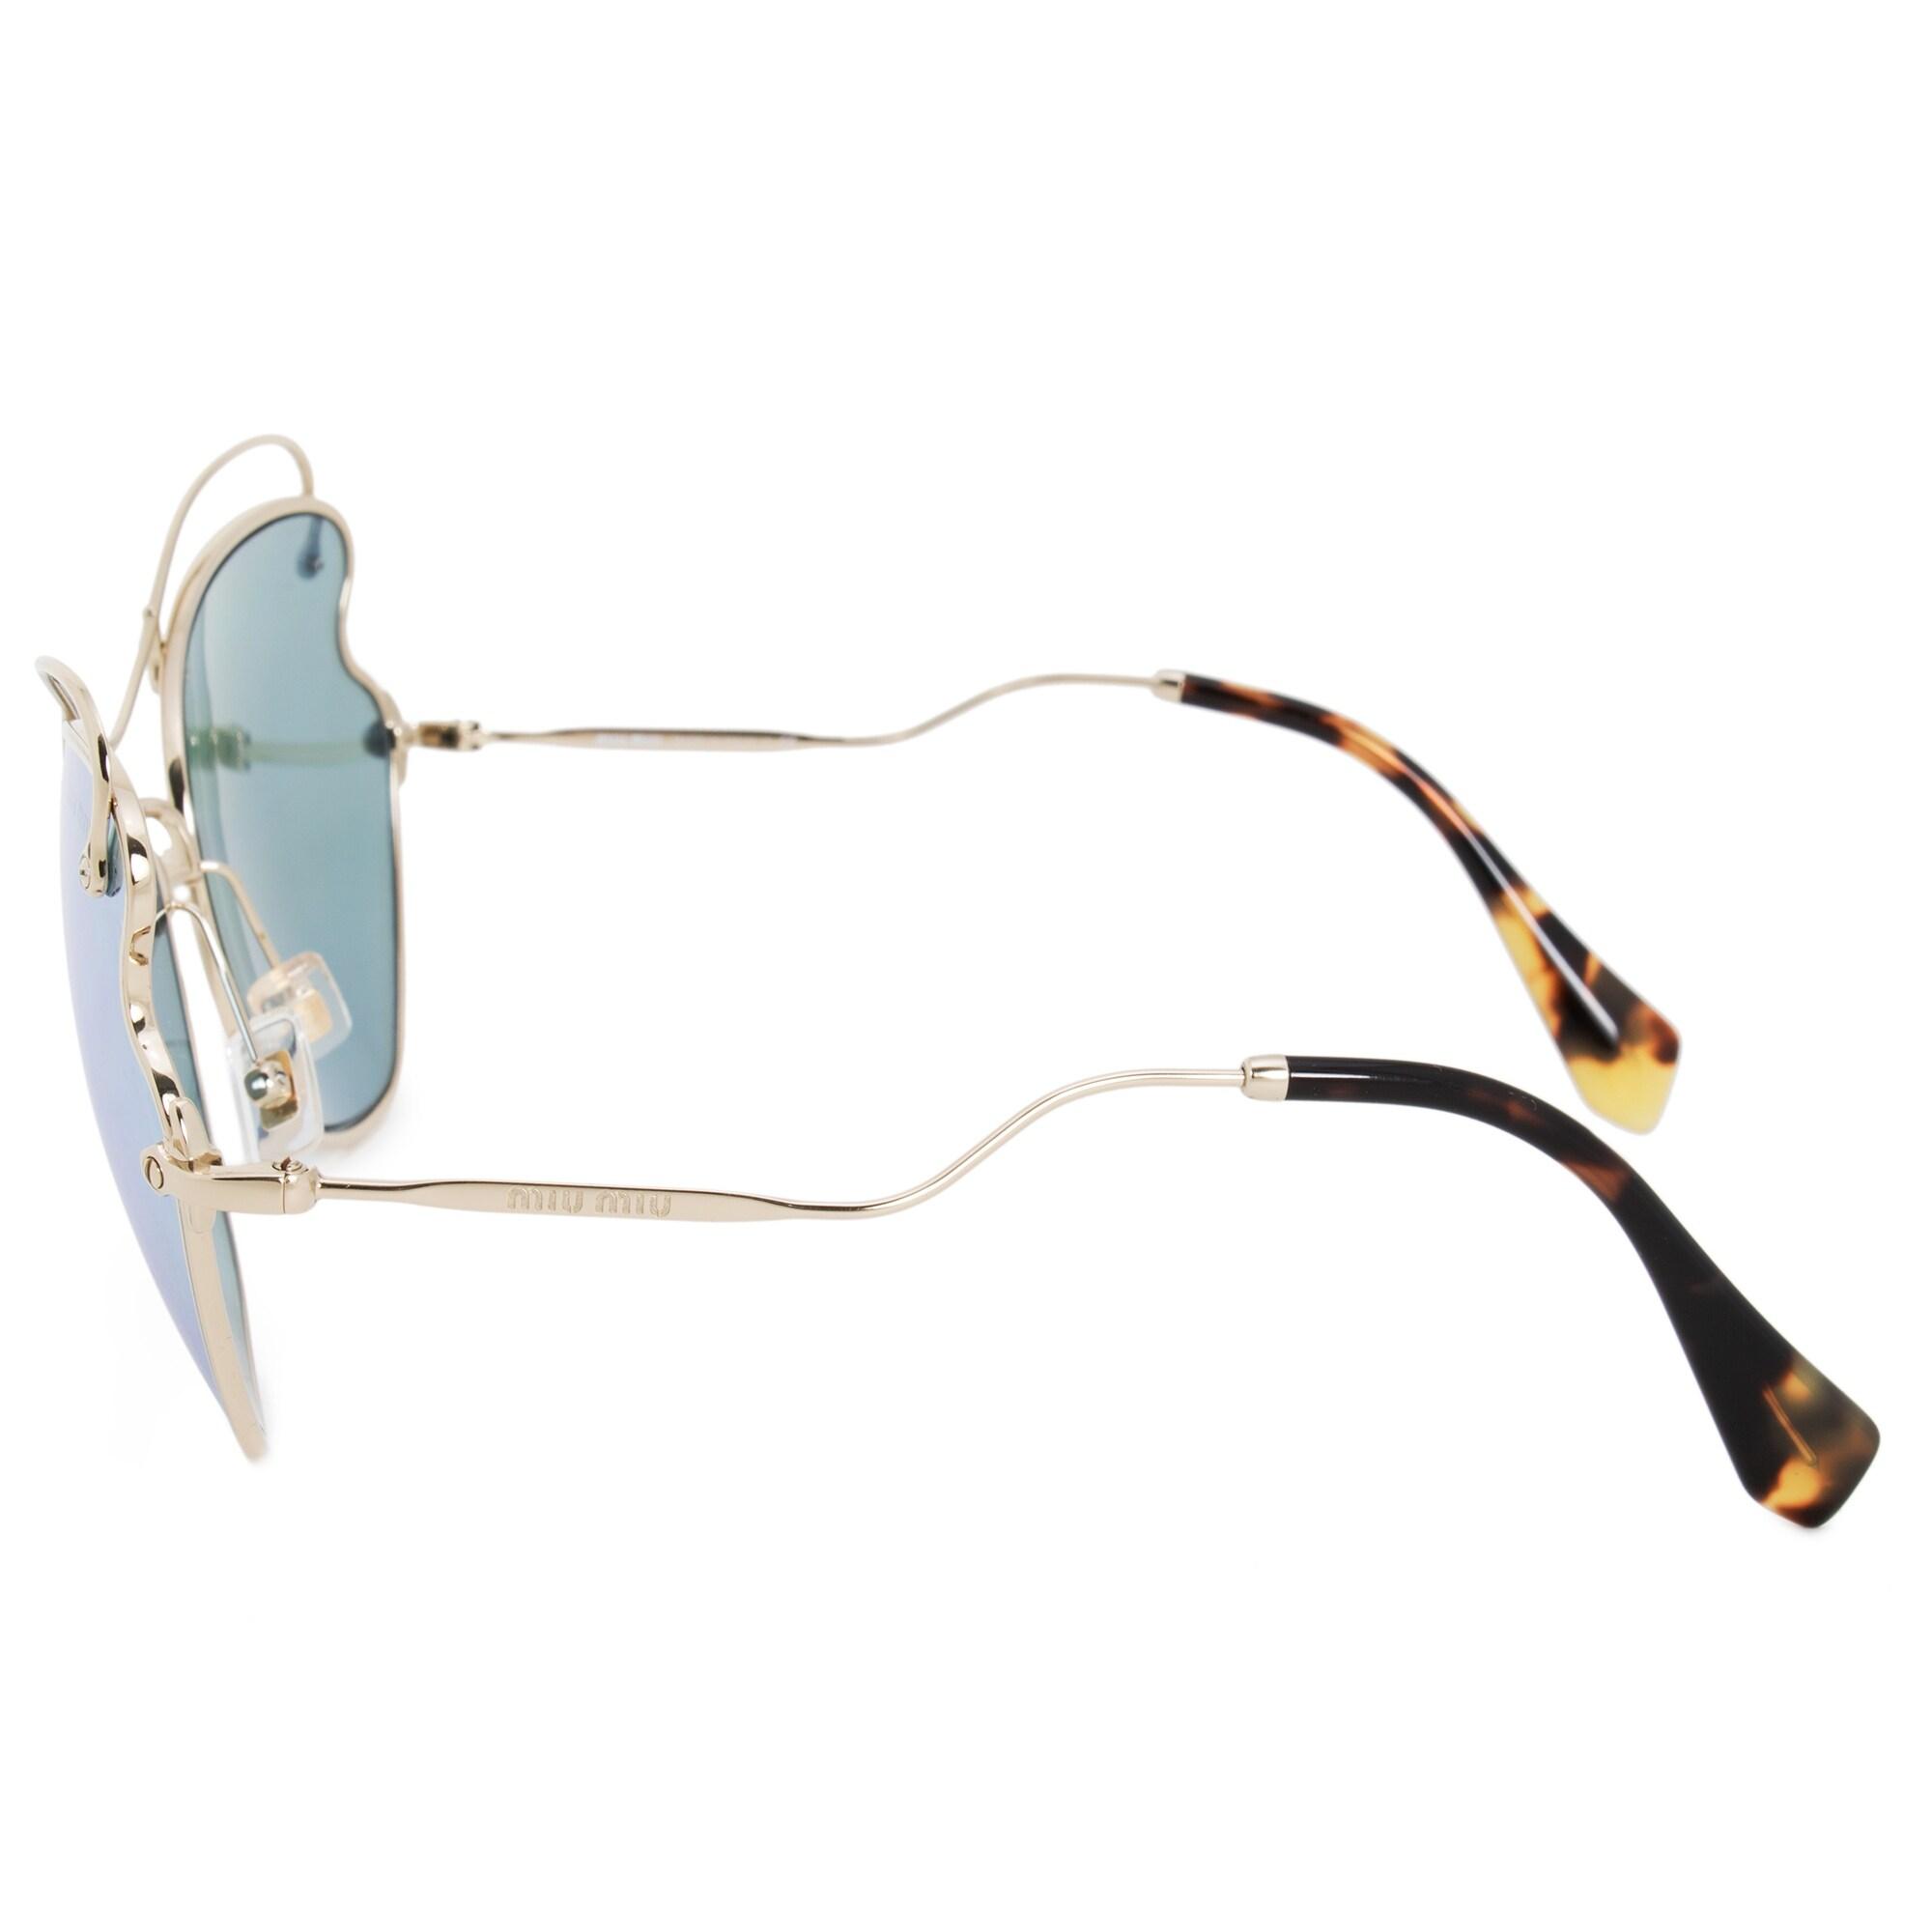 95cf38fbcf34 Shop Miu Miu Oval Sunglasses SMU56RS ZVN5Q0 65 - Free Shipping Today -  Overstock - 21408723